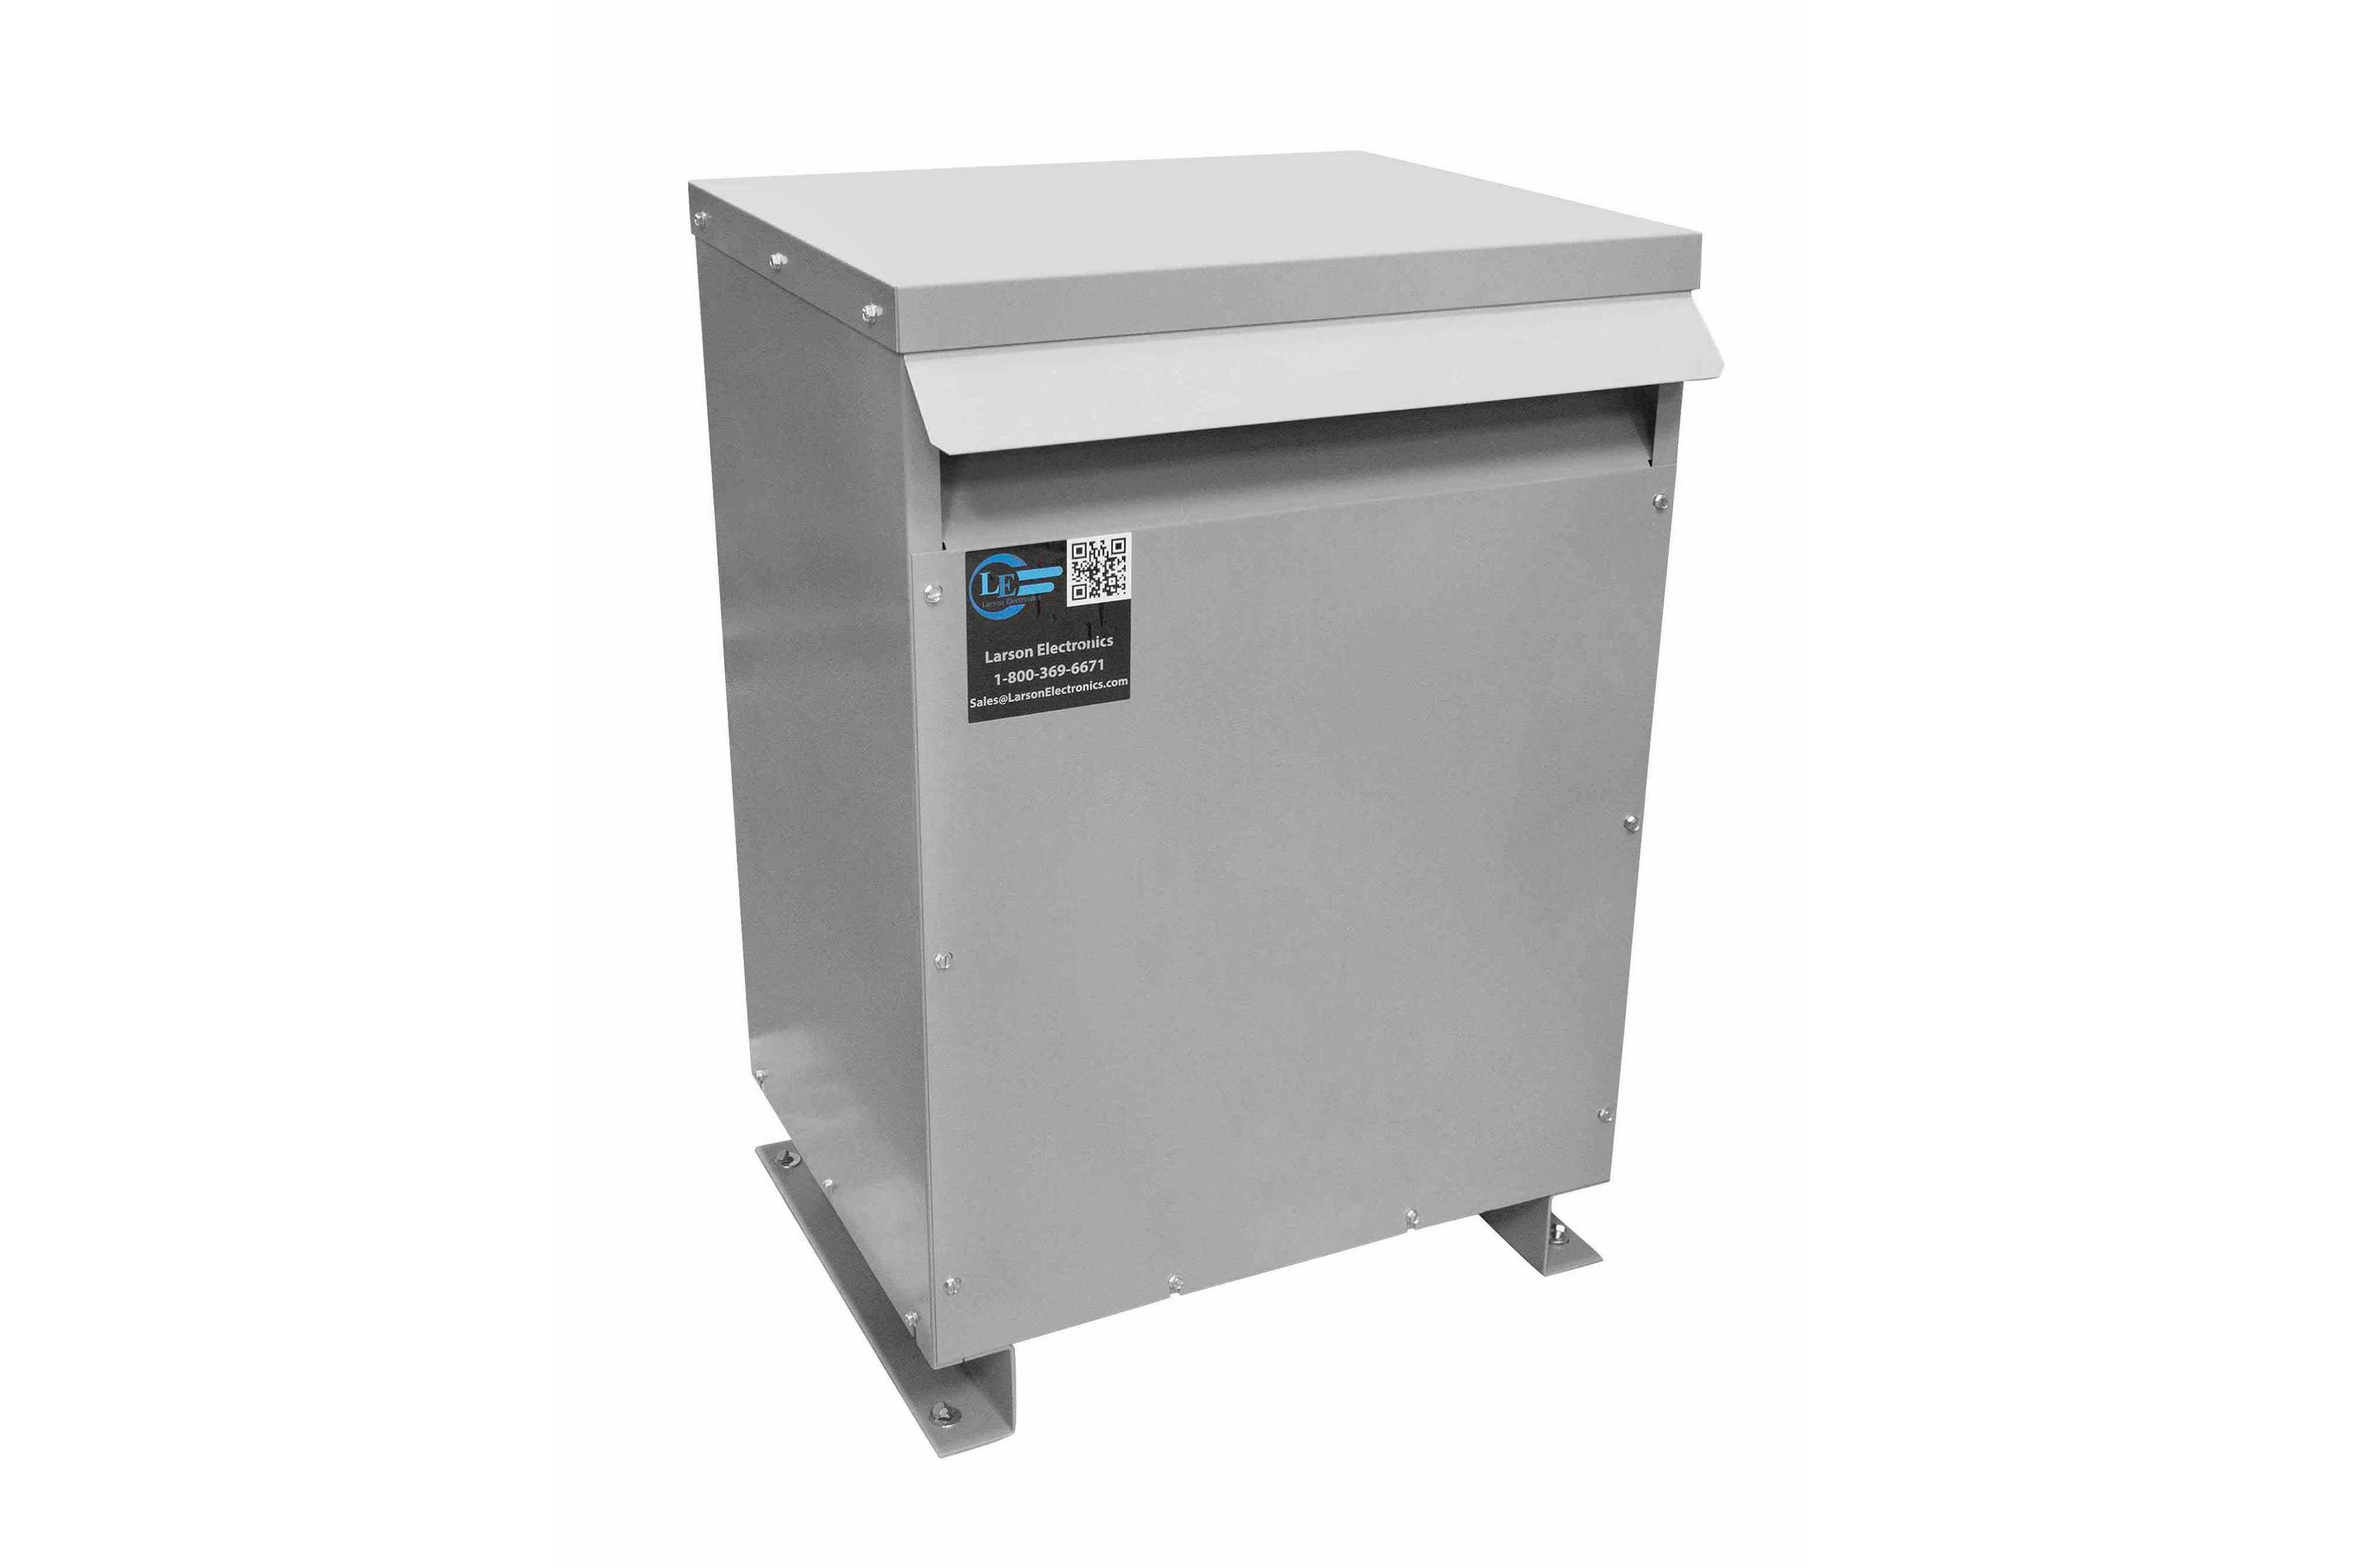 250 kVA 3PH Isolation Transformer, 380V Wye Primary, 240V/120 Delta Secondary, N3R, Ventilated, 60 Hz